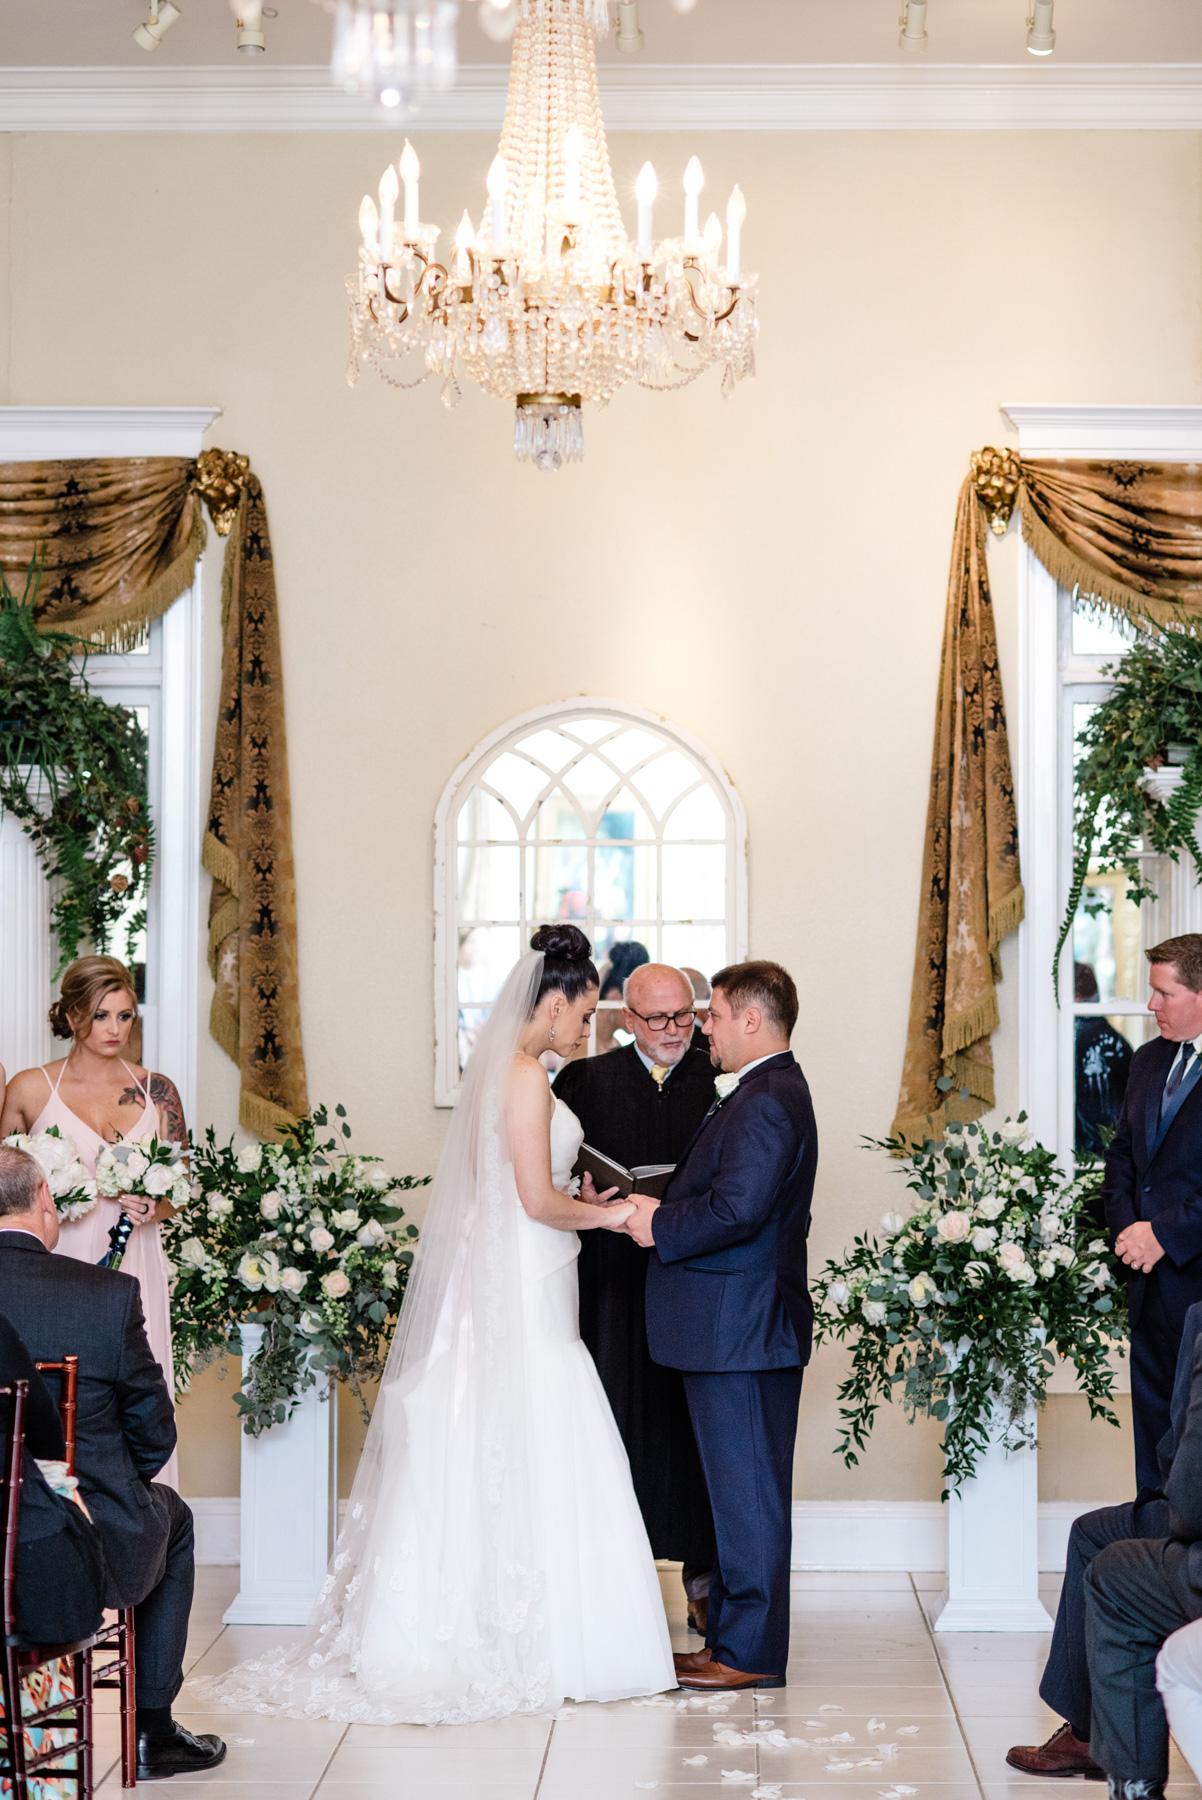 lake-house-reception-center-wedding-la-6200.jpg